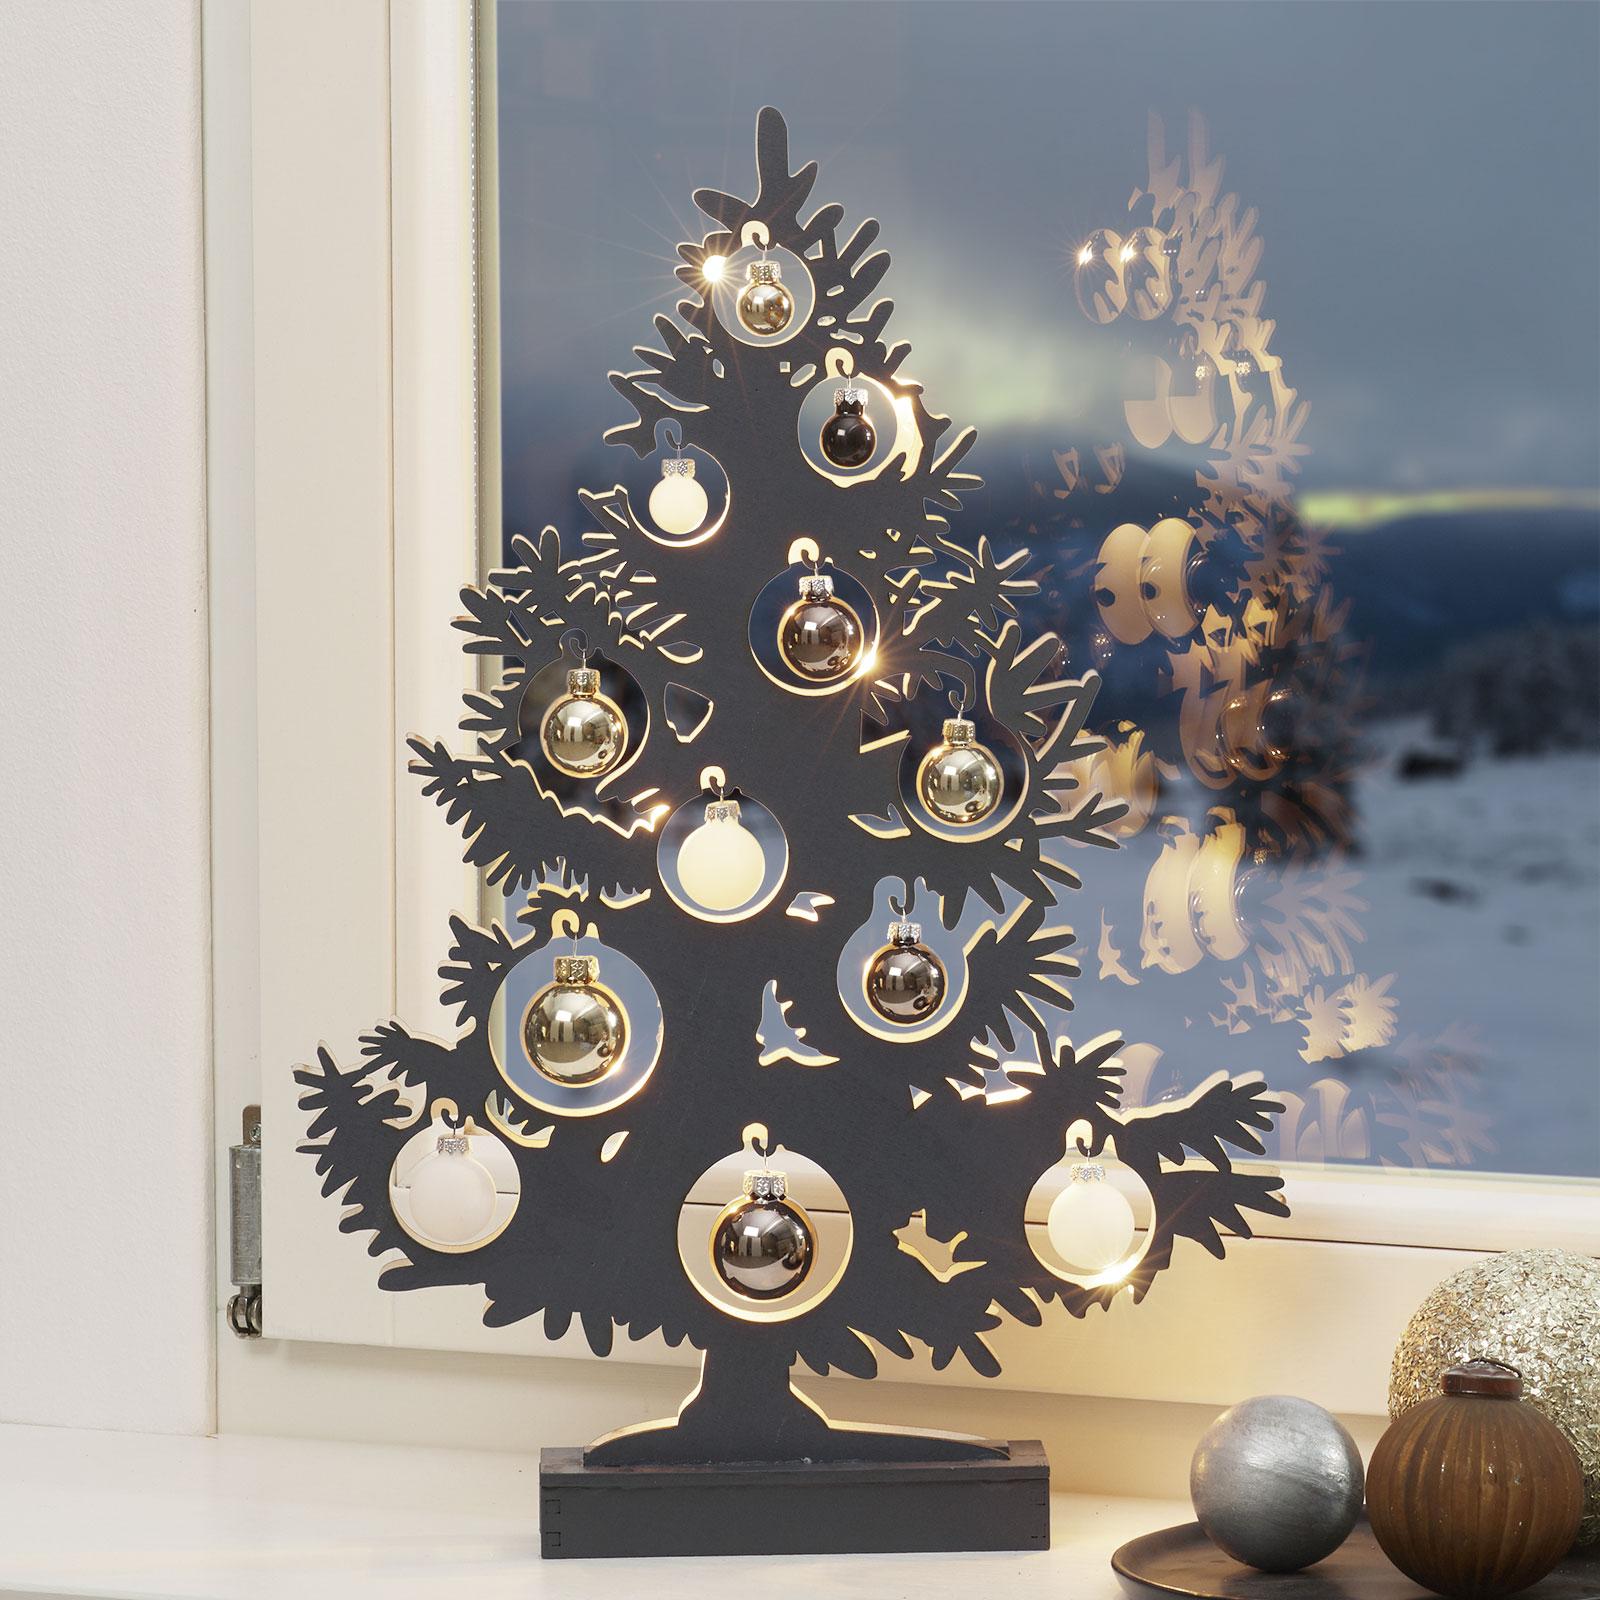 Christmas Tree LED decorative light anthracite